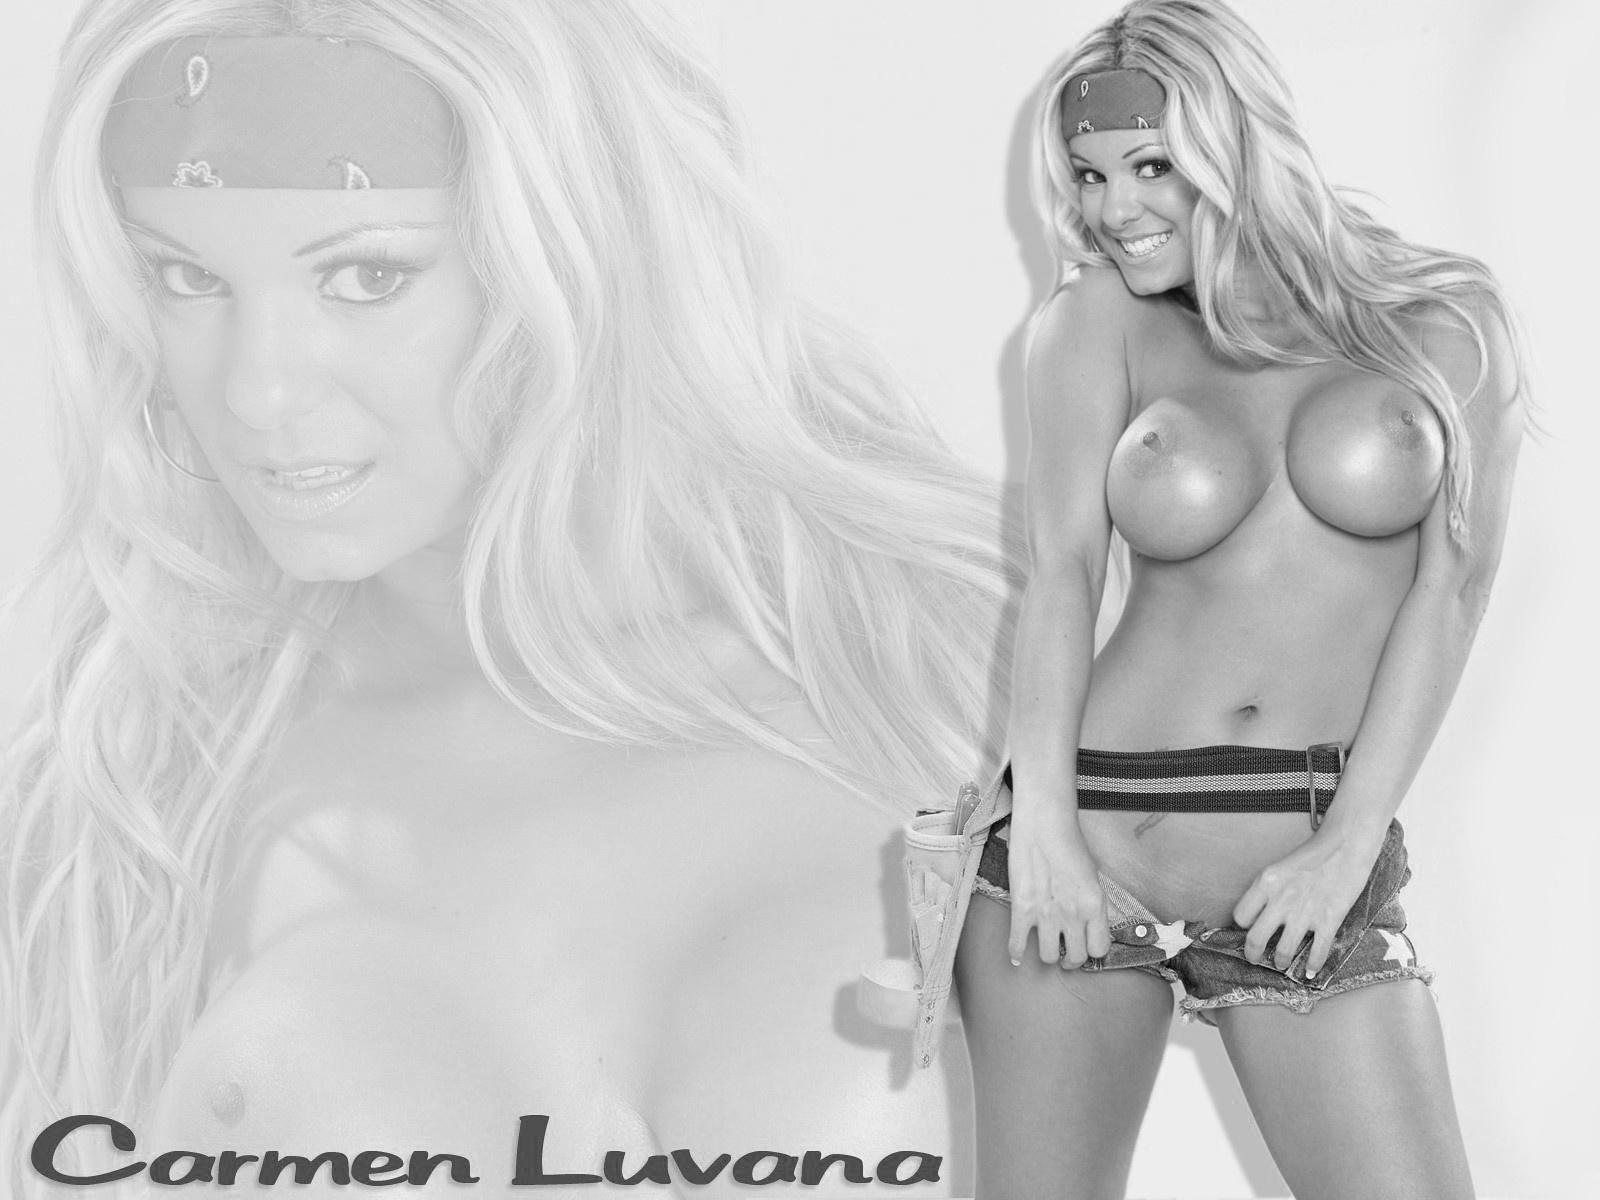 Carmen luvana boobs